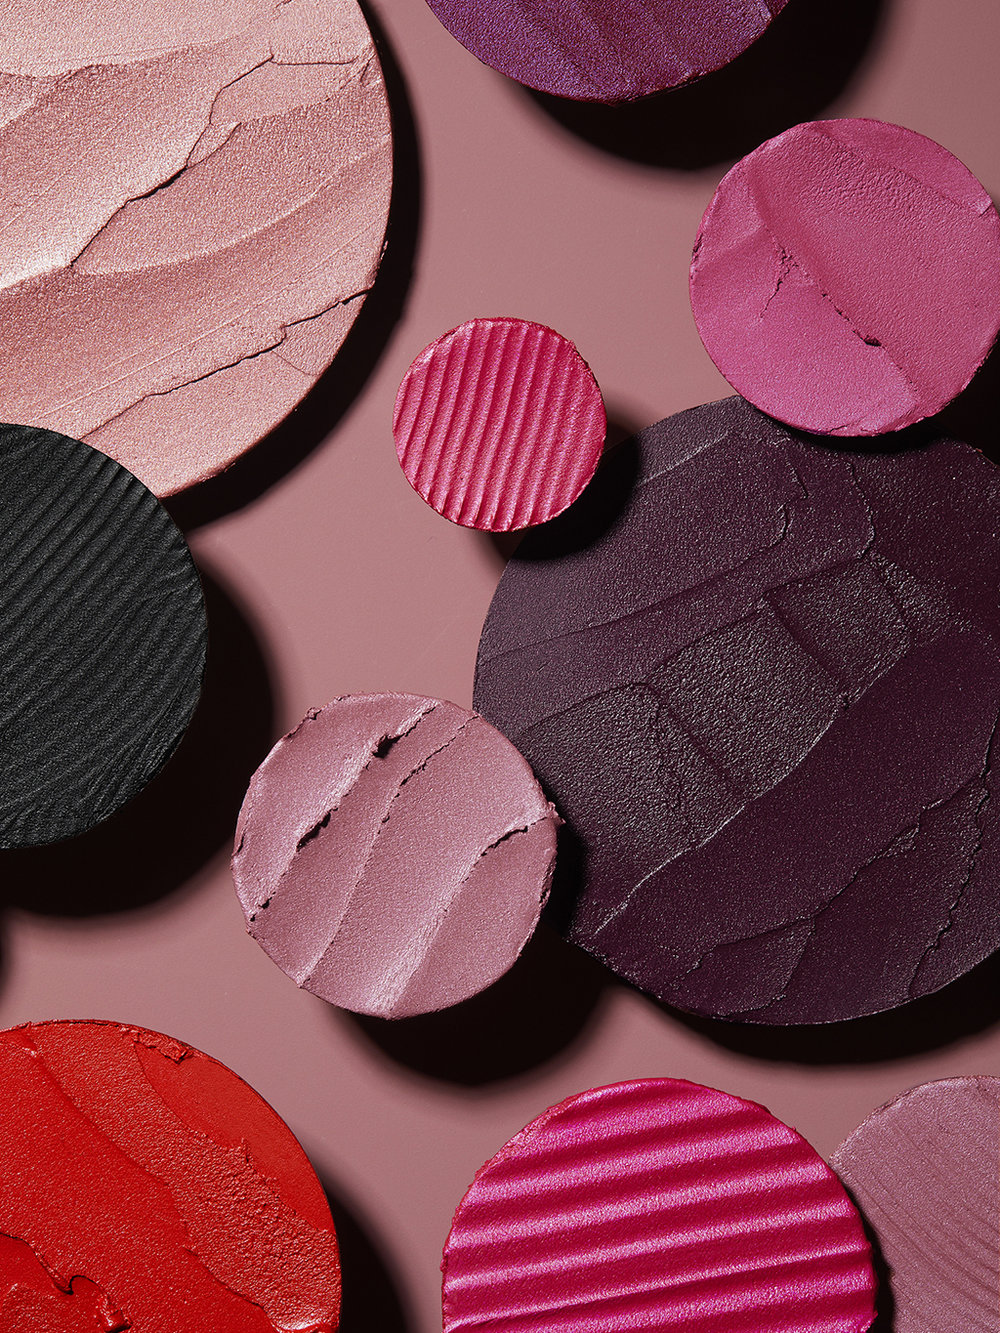 Jon Paterson_Cosmetics_Textures028.jpg